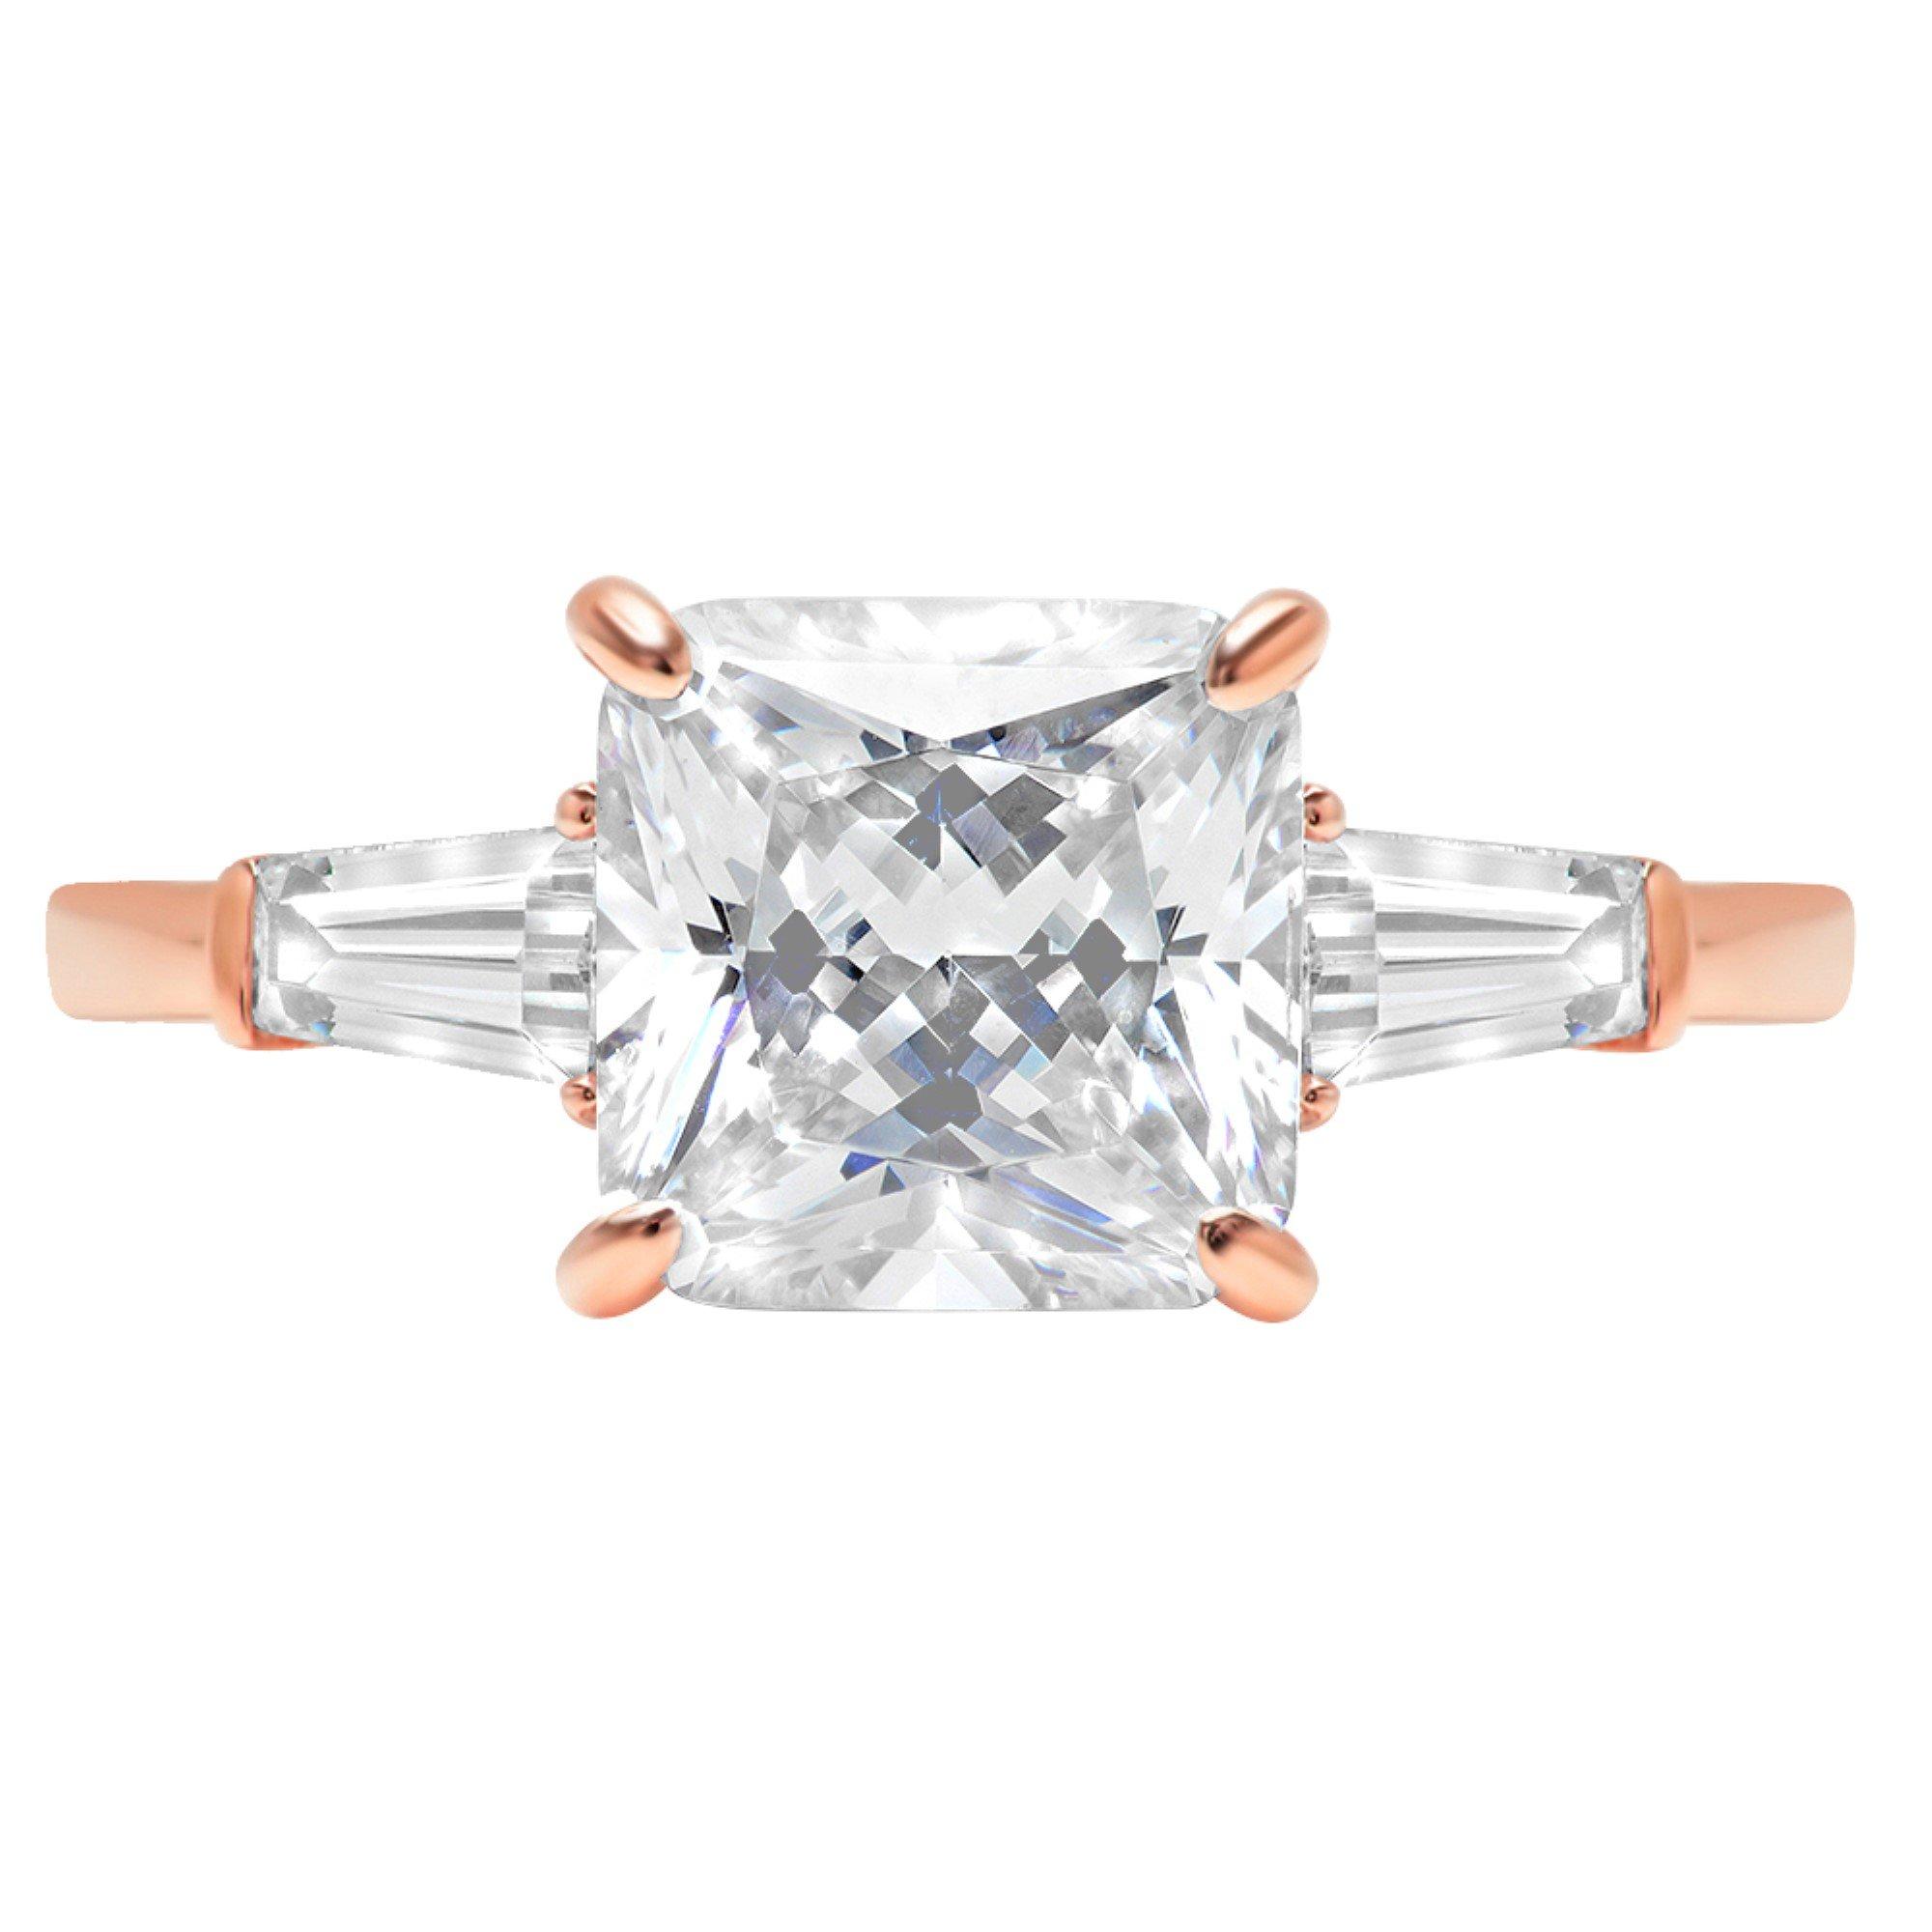 14k Rose Gold 3.3ct Asscher Baguette 3-Stone Classic Solitaire Designer Wedding Bridal Statement Anniversary Engagement Promise Ring, 11, 11